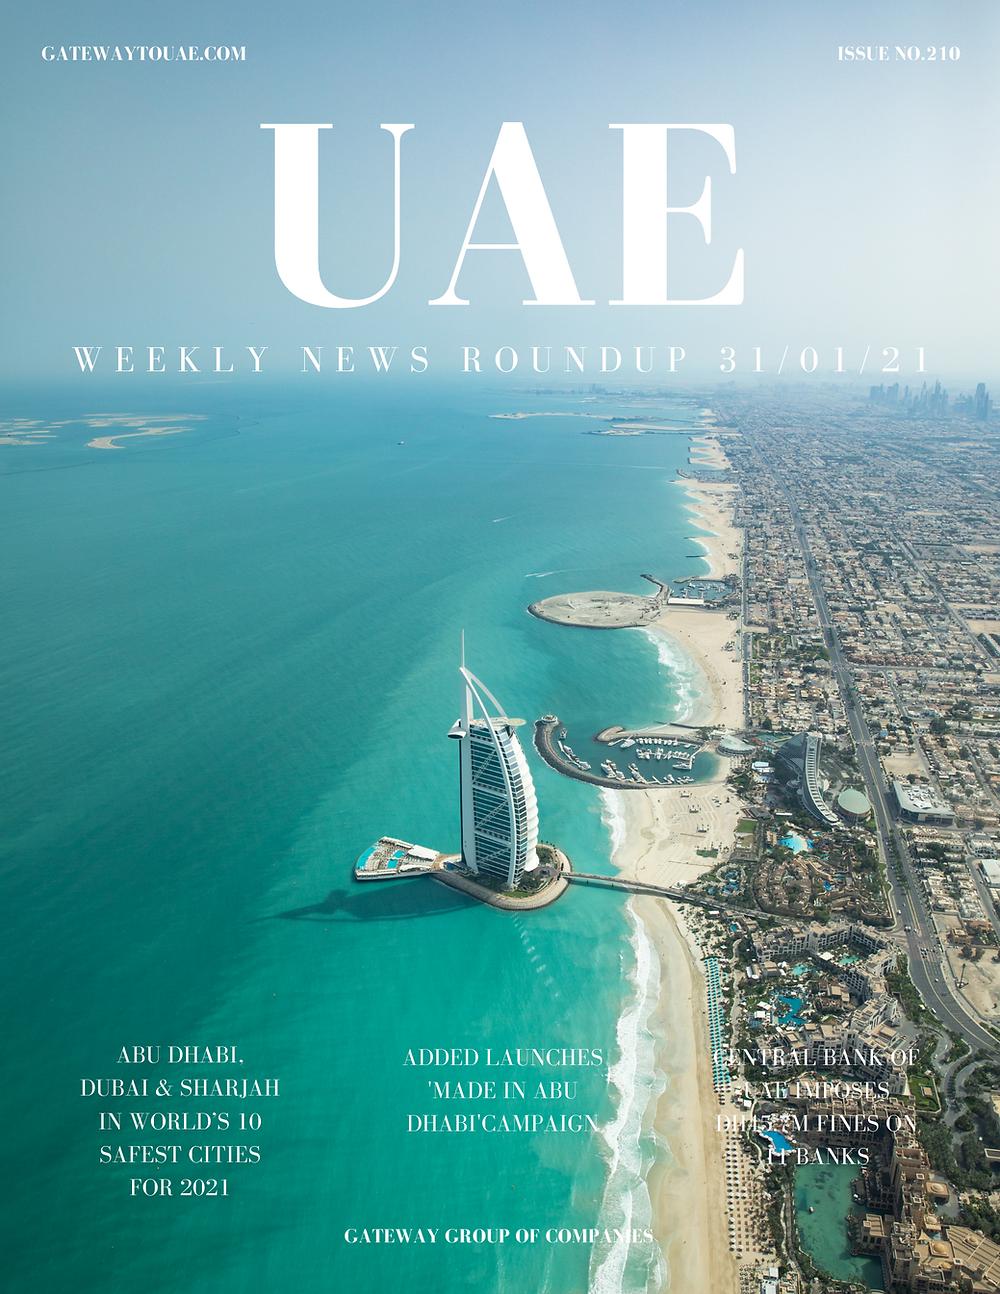 UAE business news headlines 31st January 2021 Issue 21 Gateway Group Of Companies Abu Dhabi Dubai weekly magazine company formation business setup local sponsor service agent visas